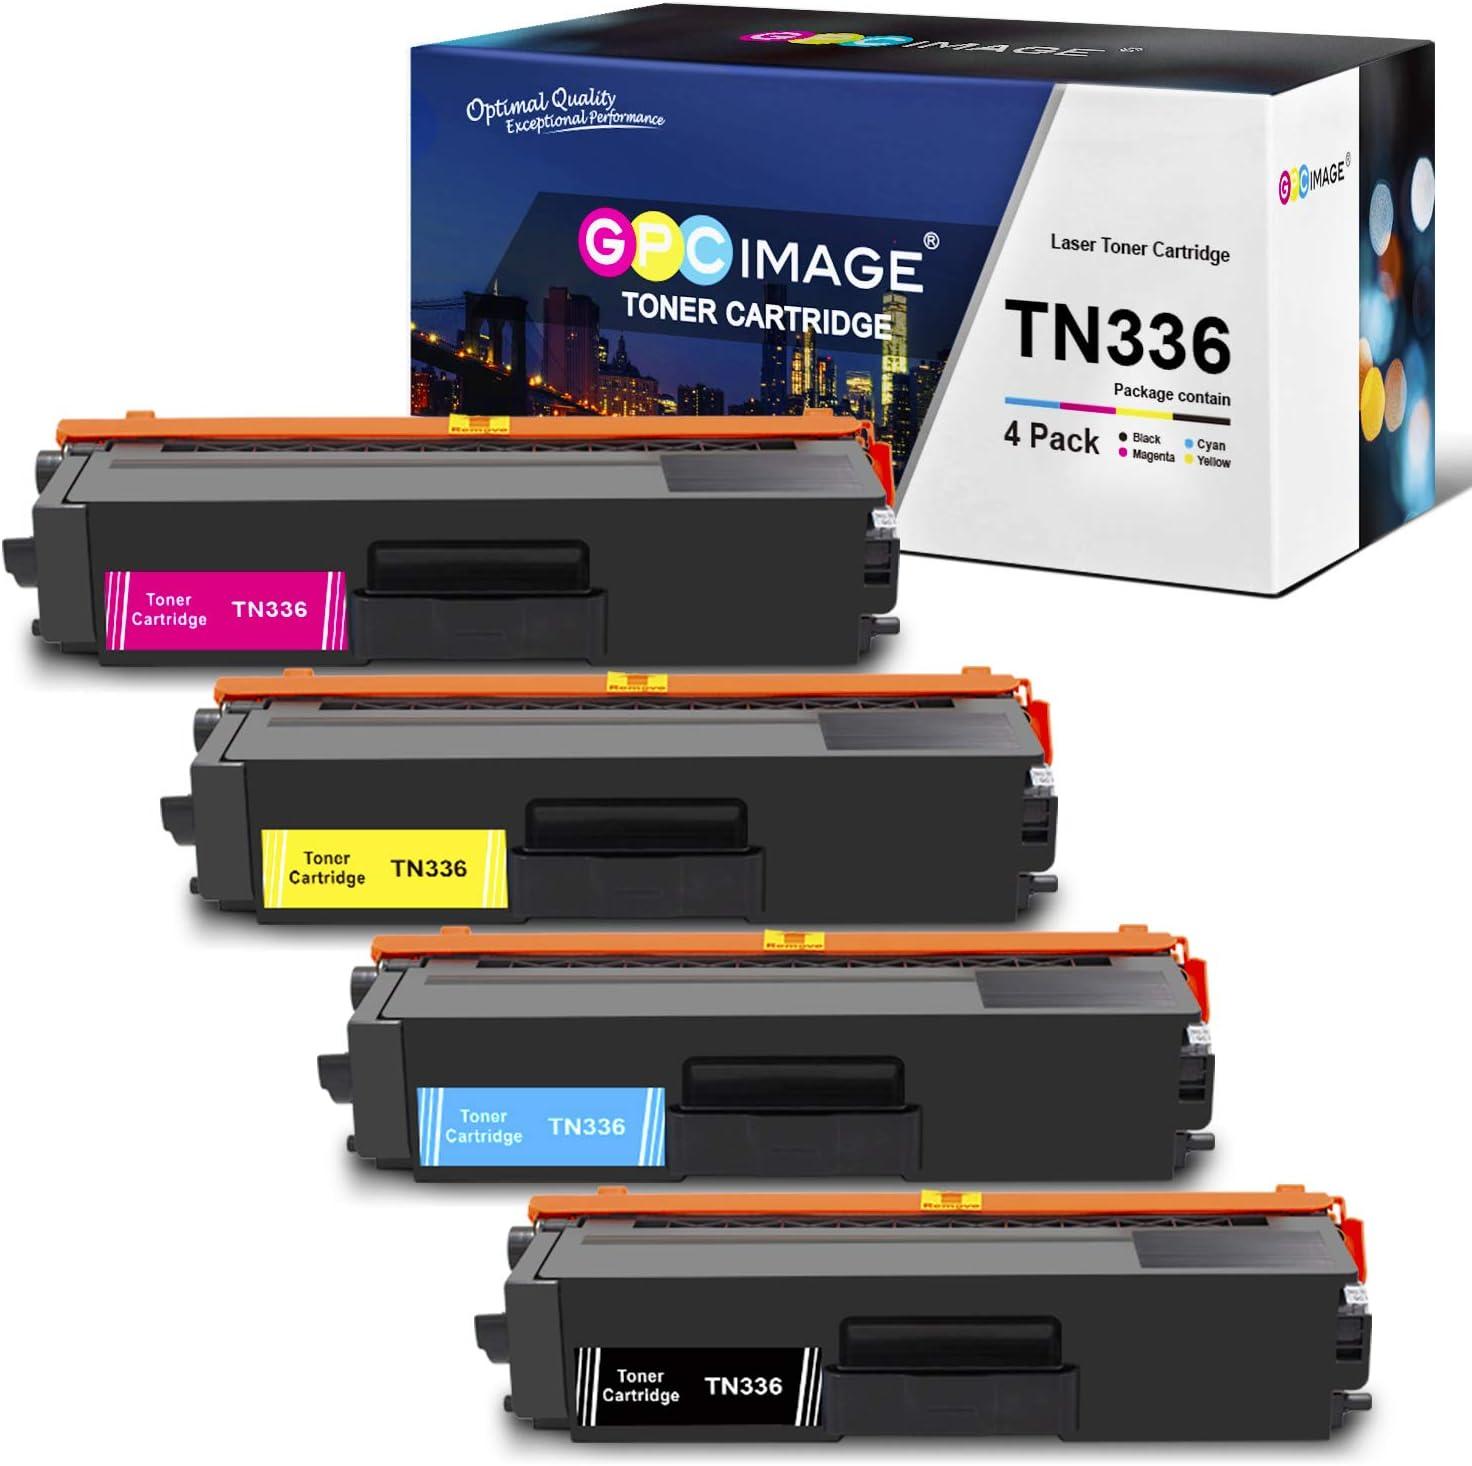 Lot Toner TN315 TN310 Set for Brother MFC-9460CDN MFC-9560CDW MFC-9970CDW